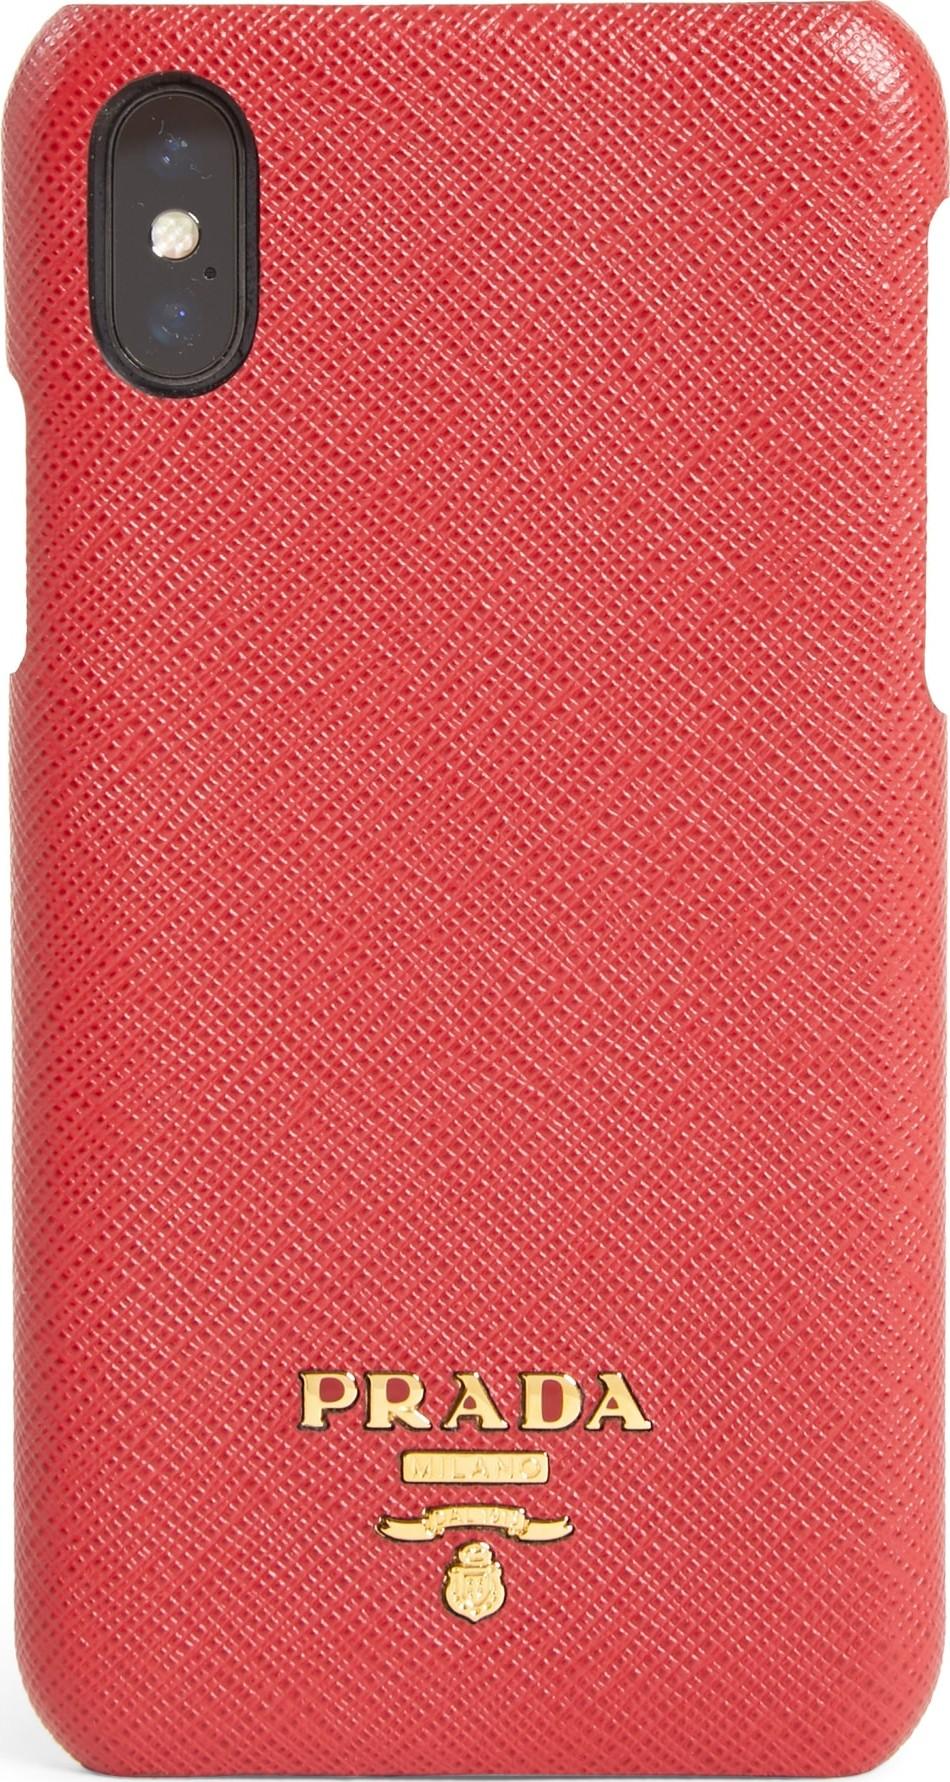 381a16b6d8 Saffiano Leather iPhone X Case